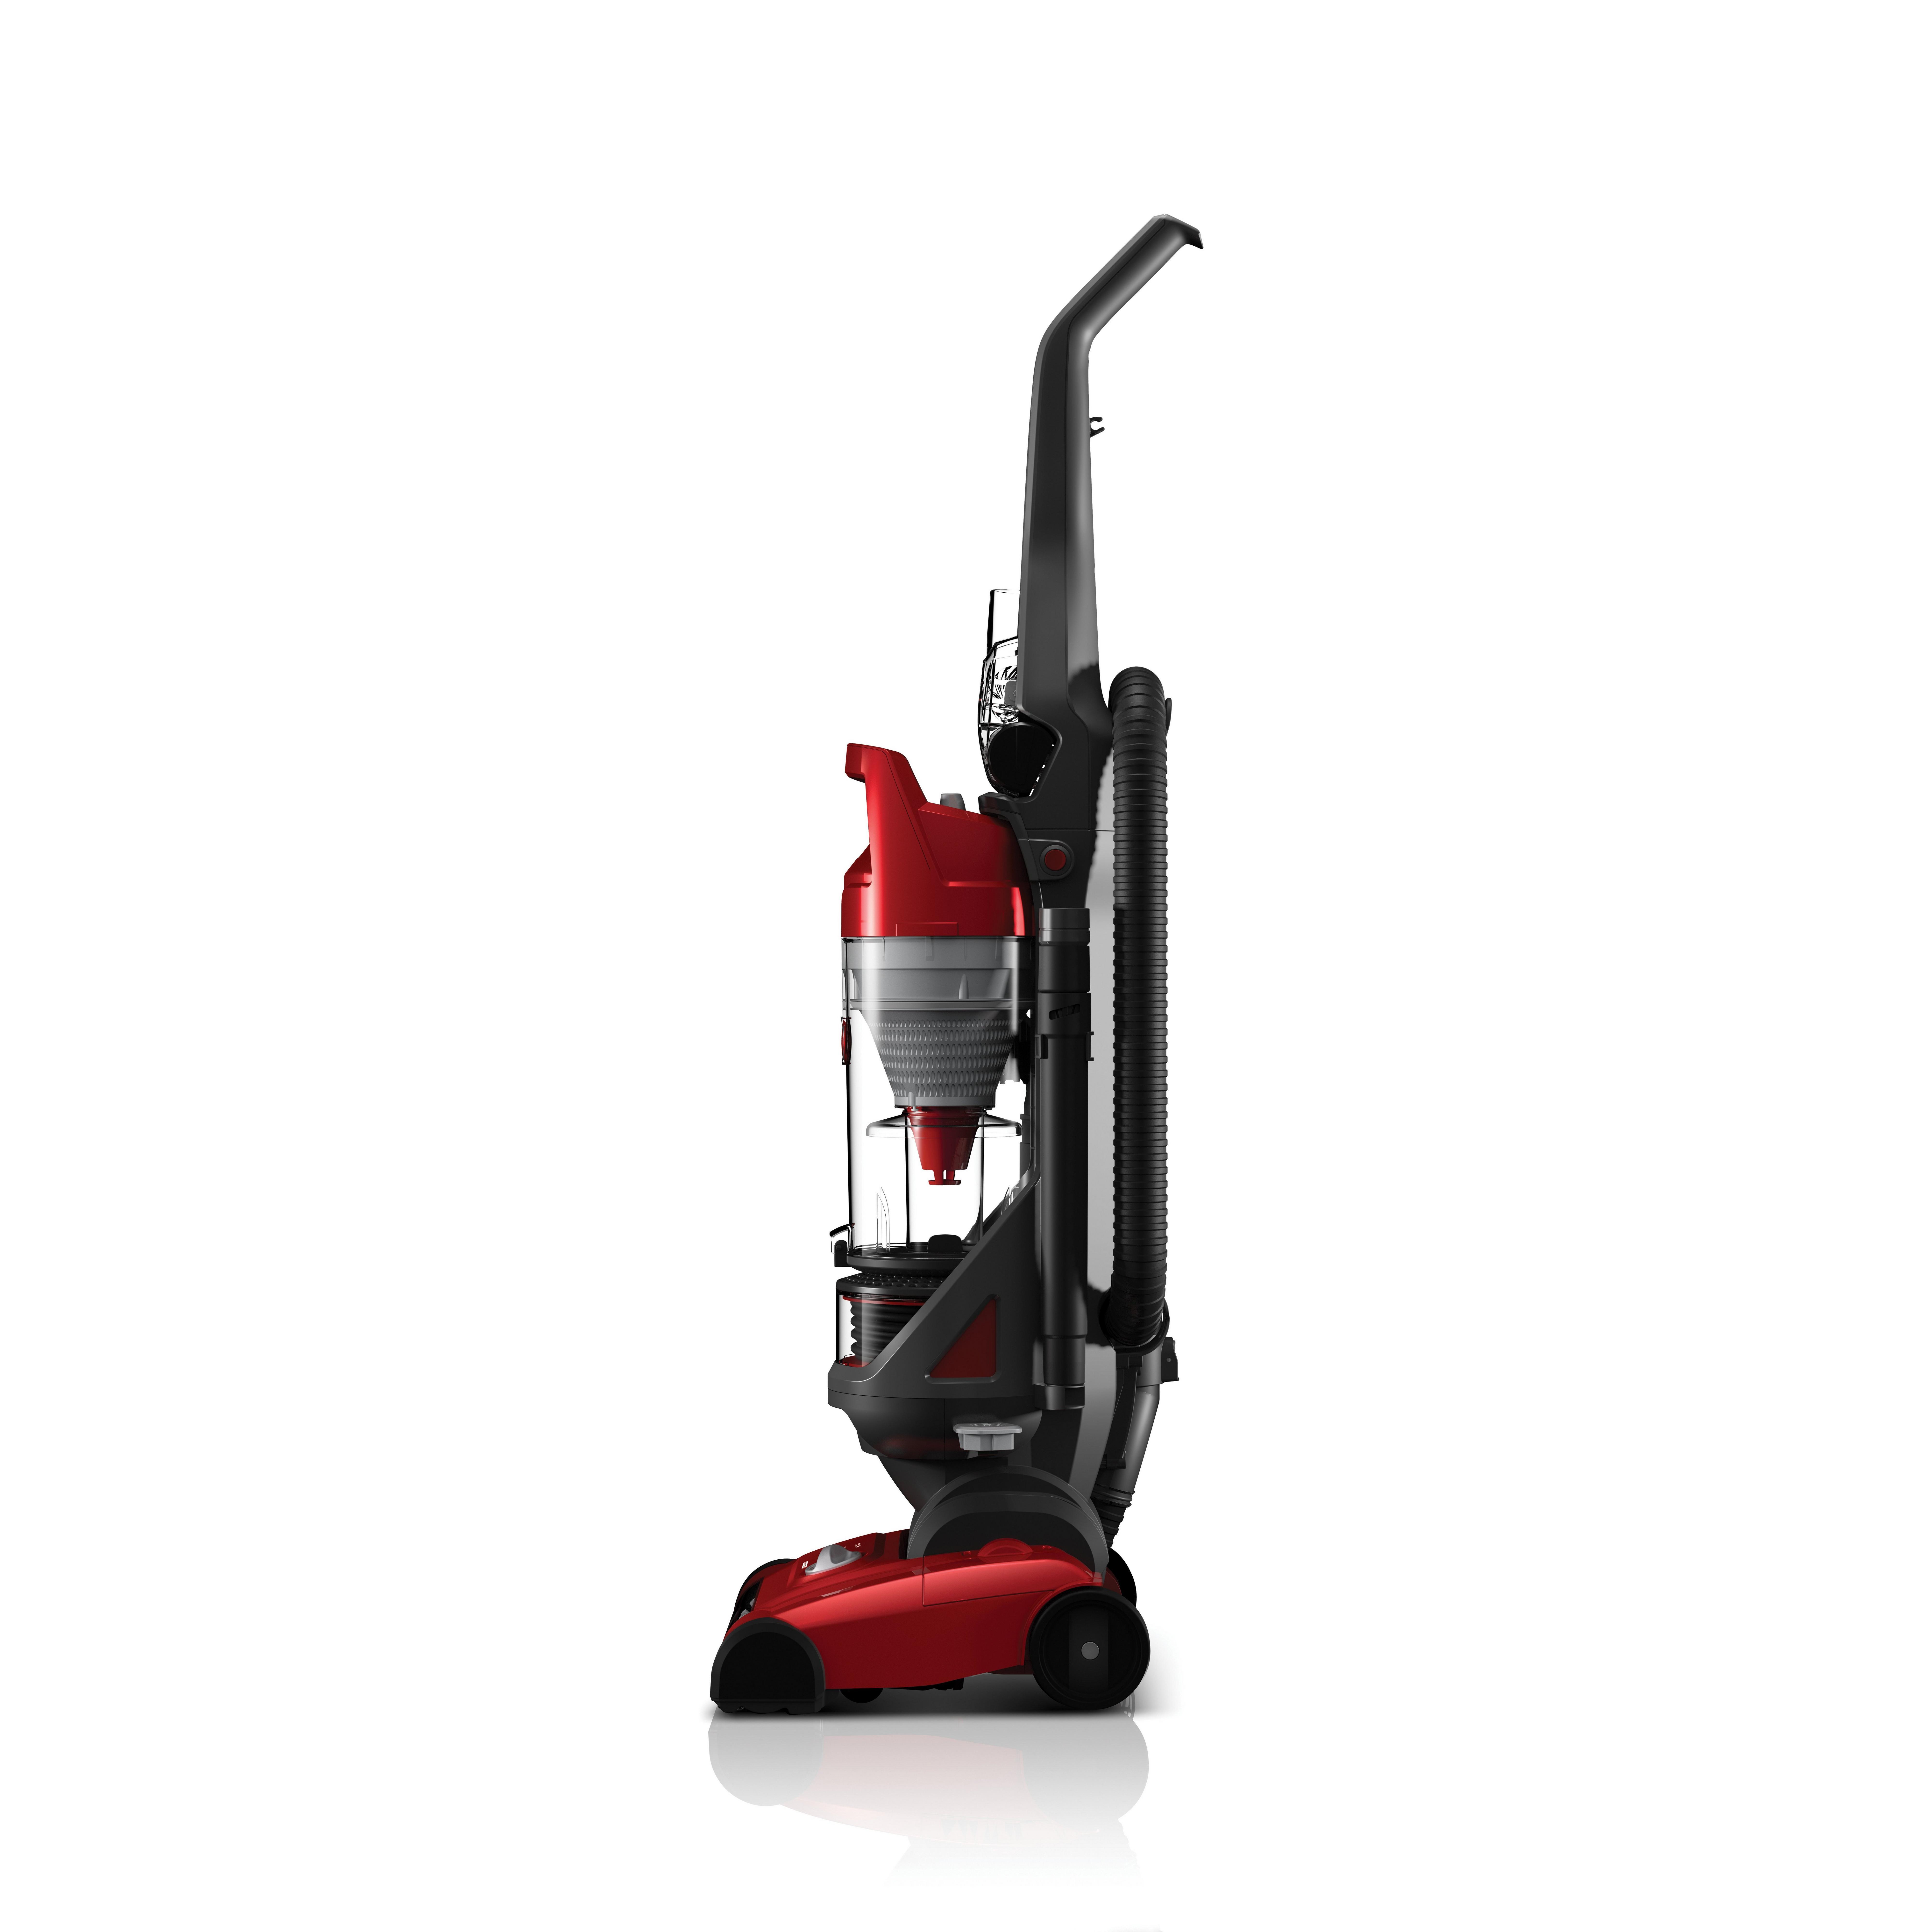 Hoover-Elite-Rewind-Upright-Vacuum-Cleaner-Damaged-Box-UH71012DM thumbnail 3